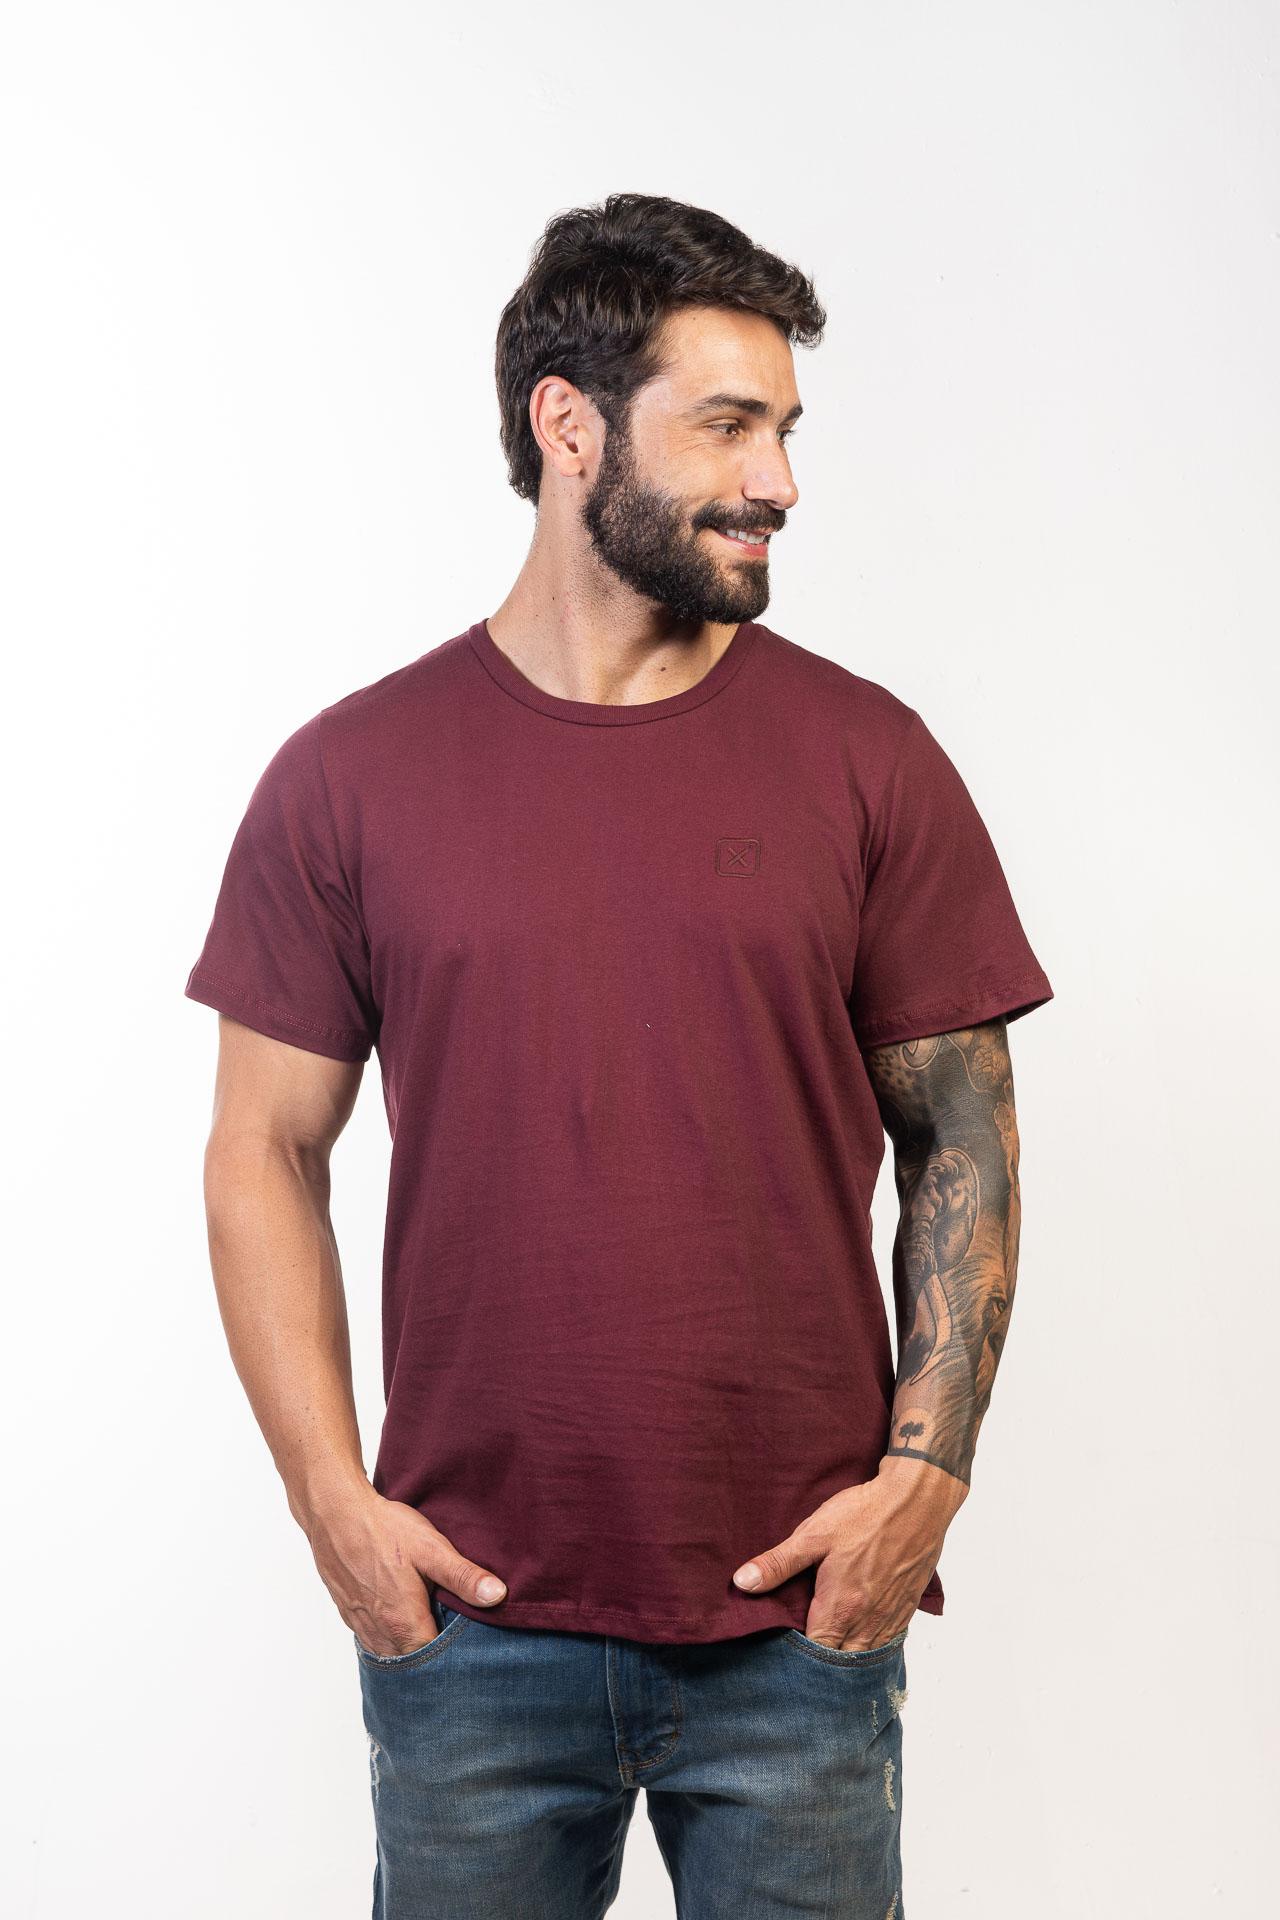 Camiseta Masculina TXC 19490